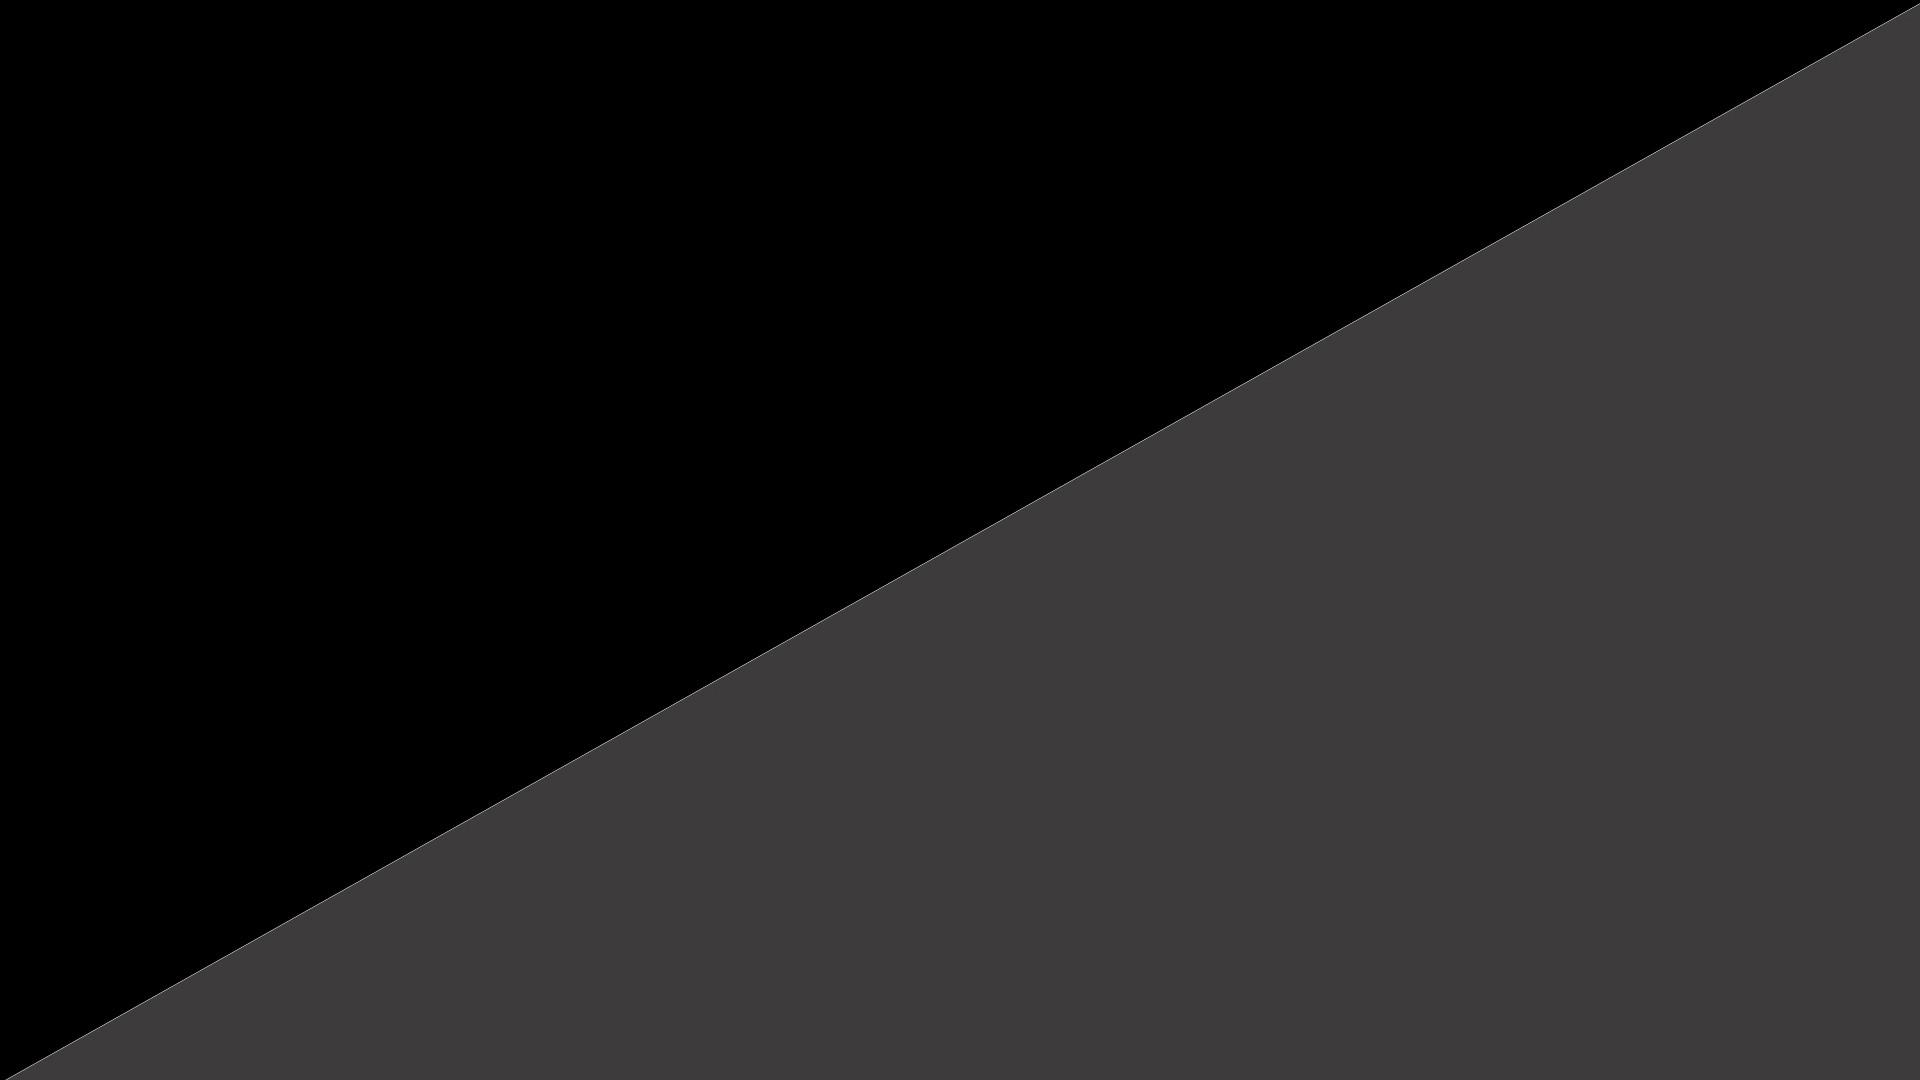 Tissu HAY - Noir / gris foncé